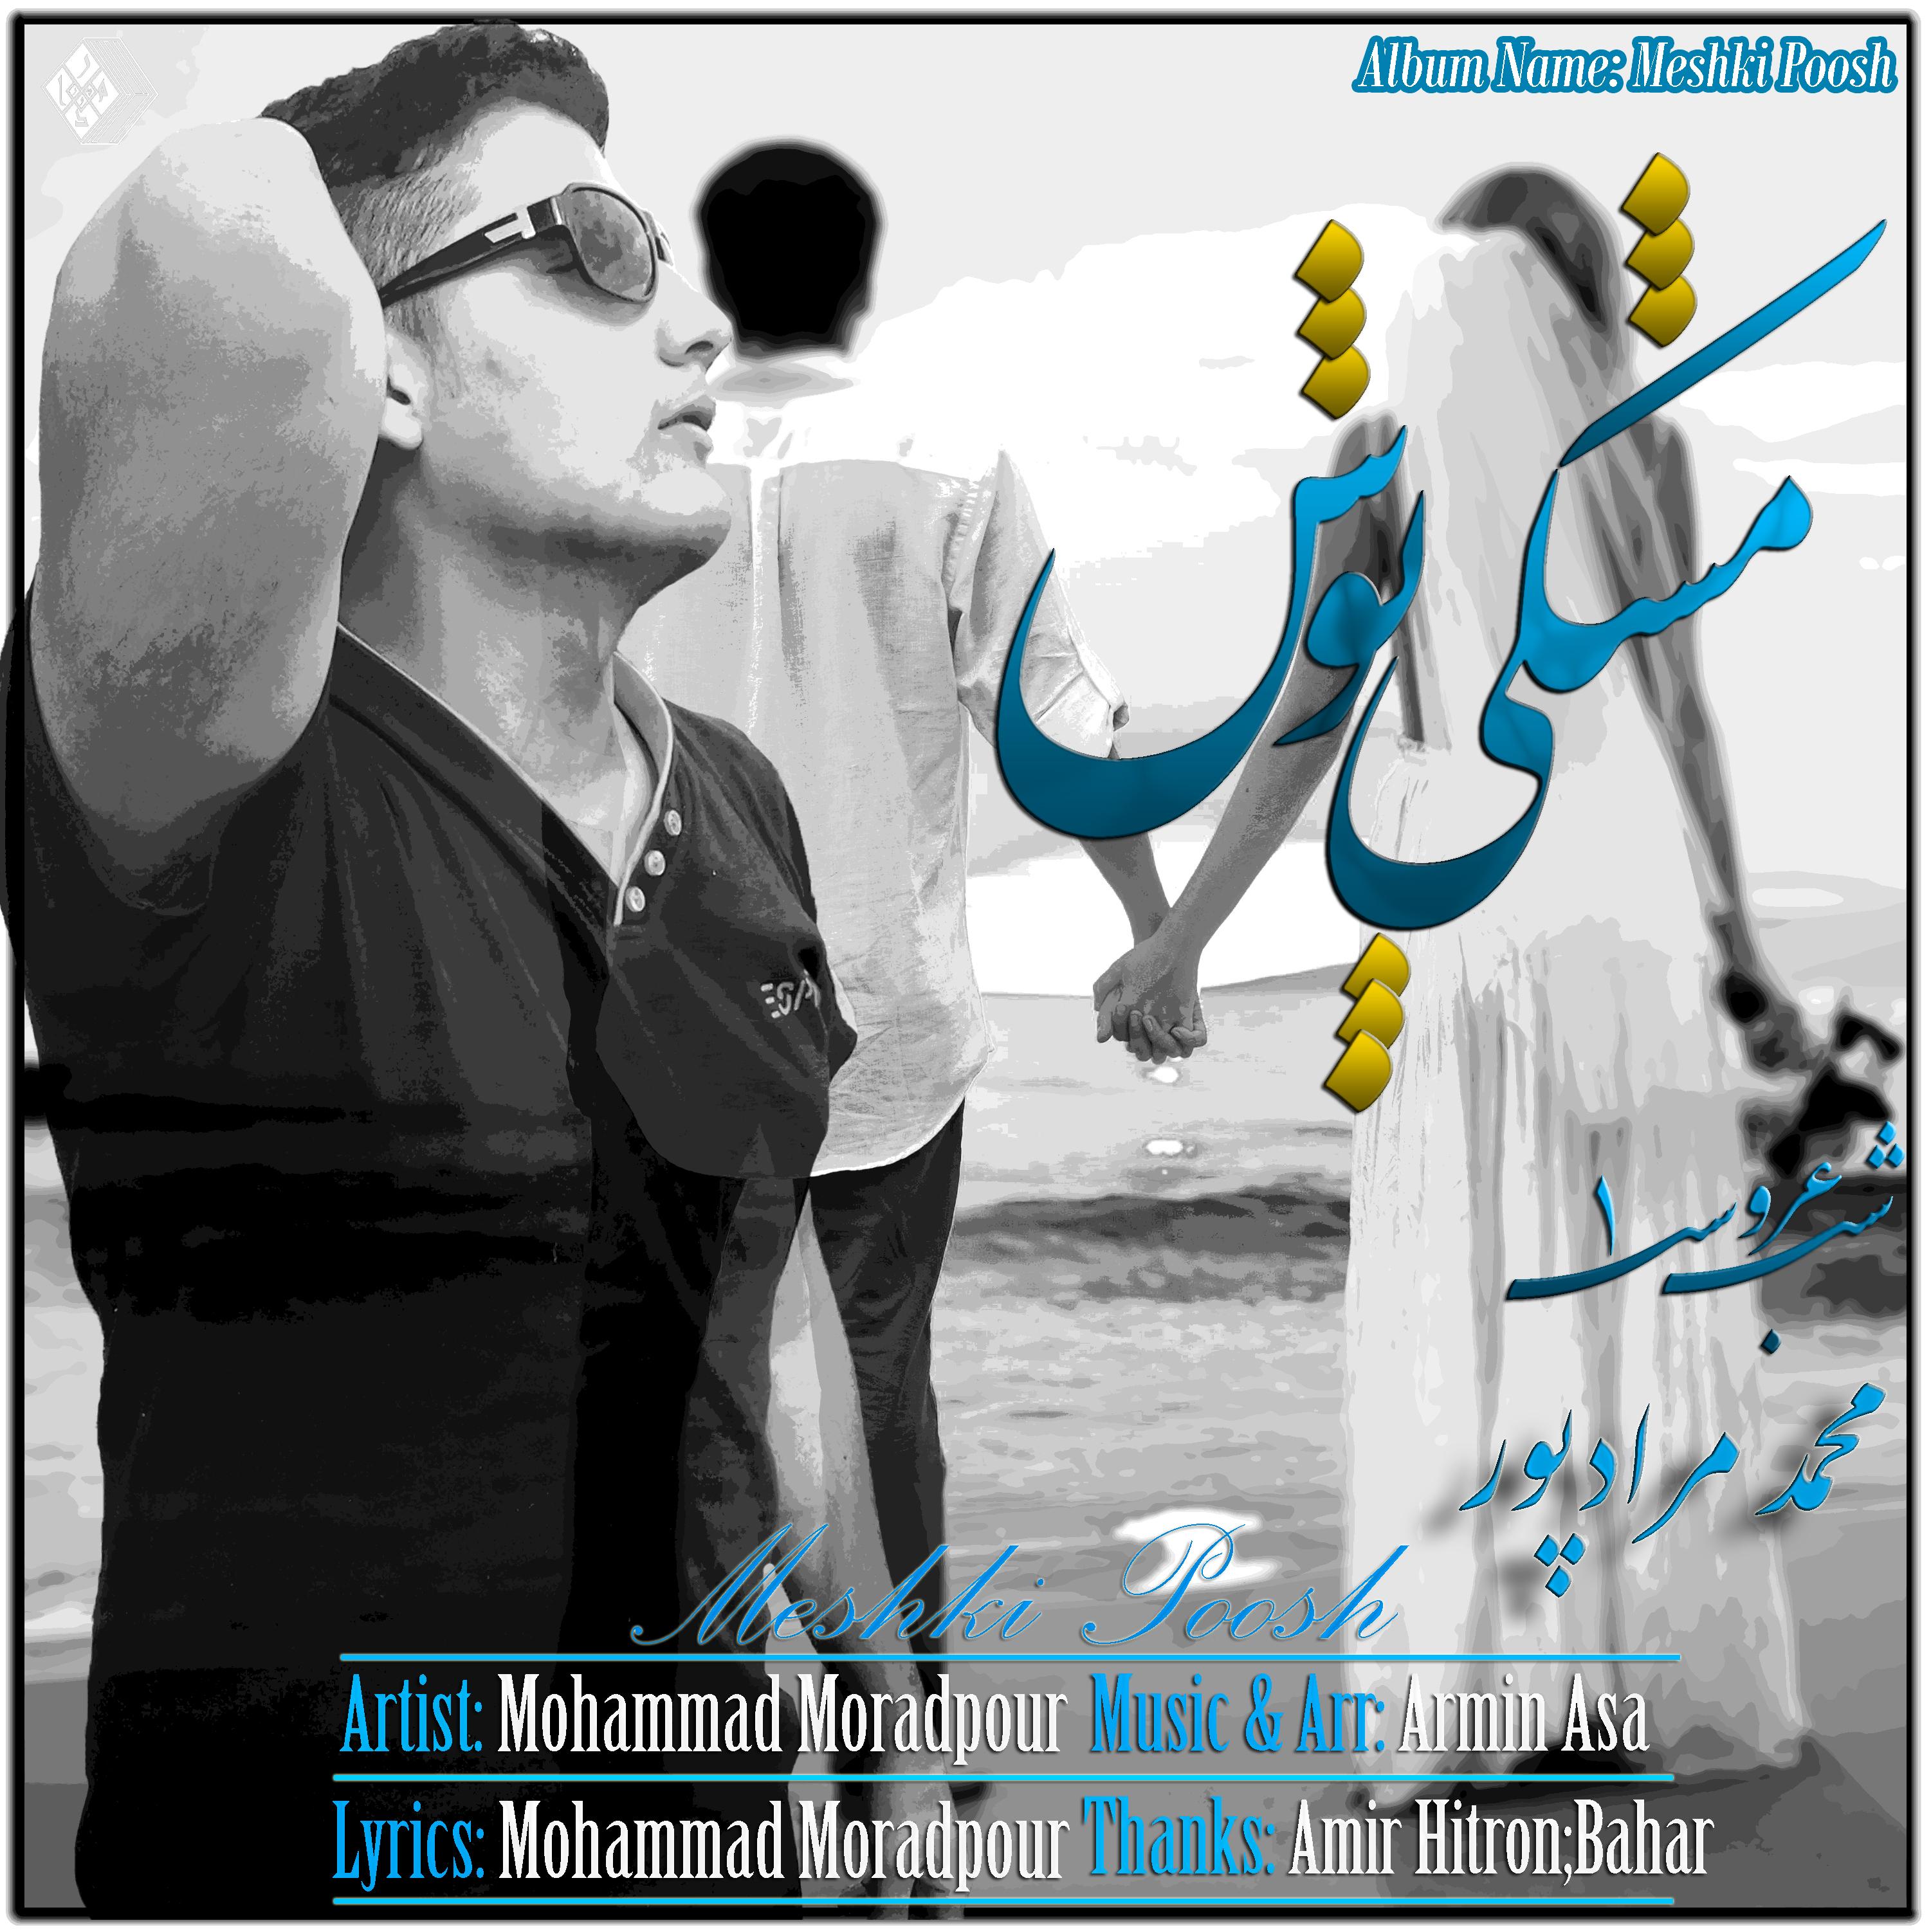 Meshki Poosh-Mohammad-Moradpour_دانلود-آهنگ-جدید-محمد-مرادپور-مشکی-پوش